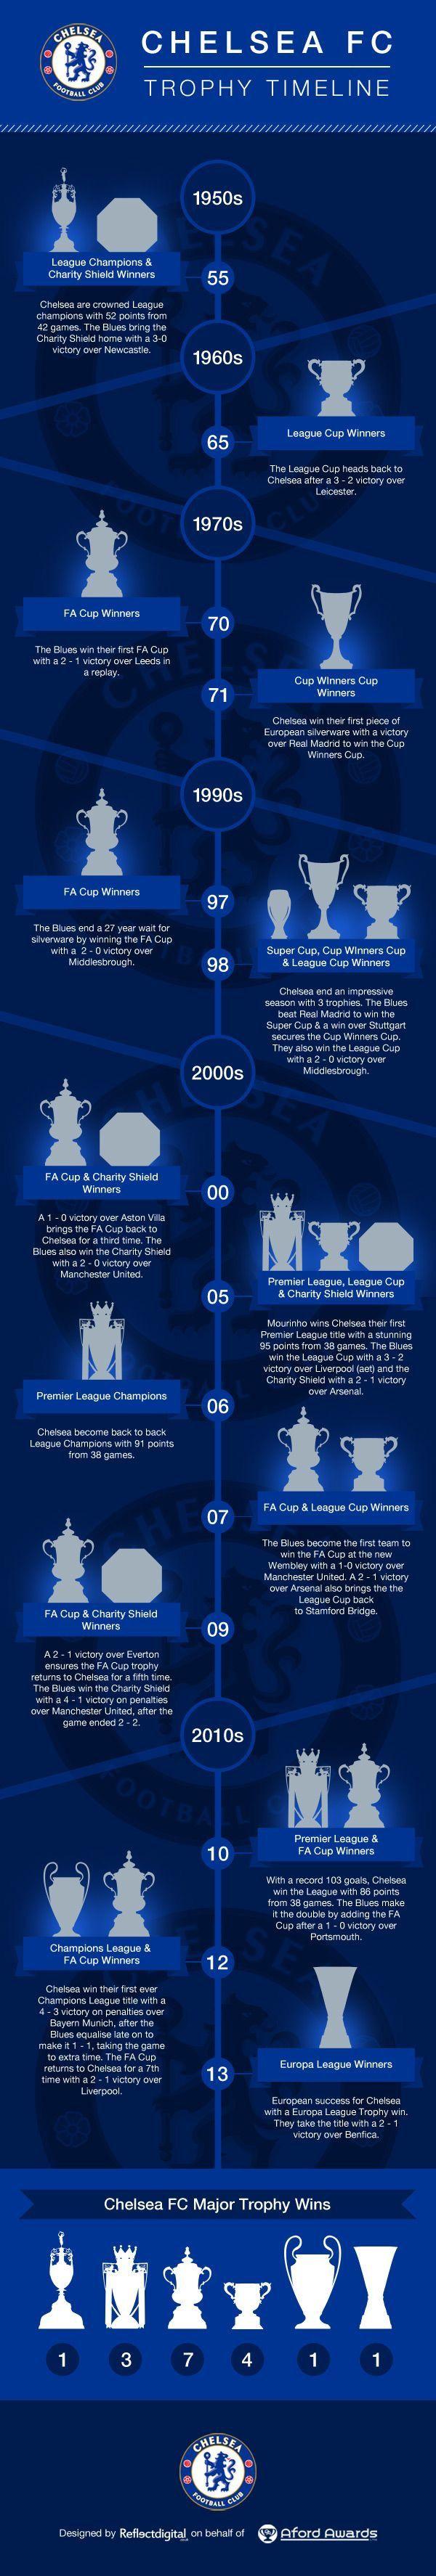 Chelsea trophy history & timeline